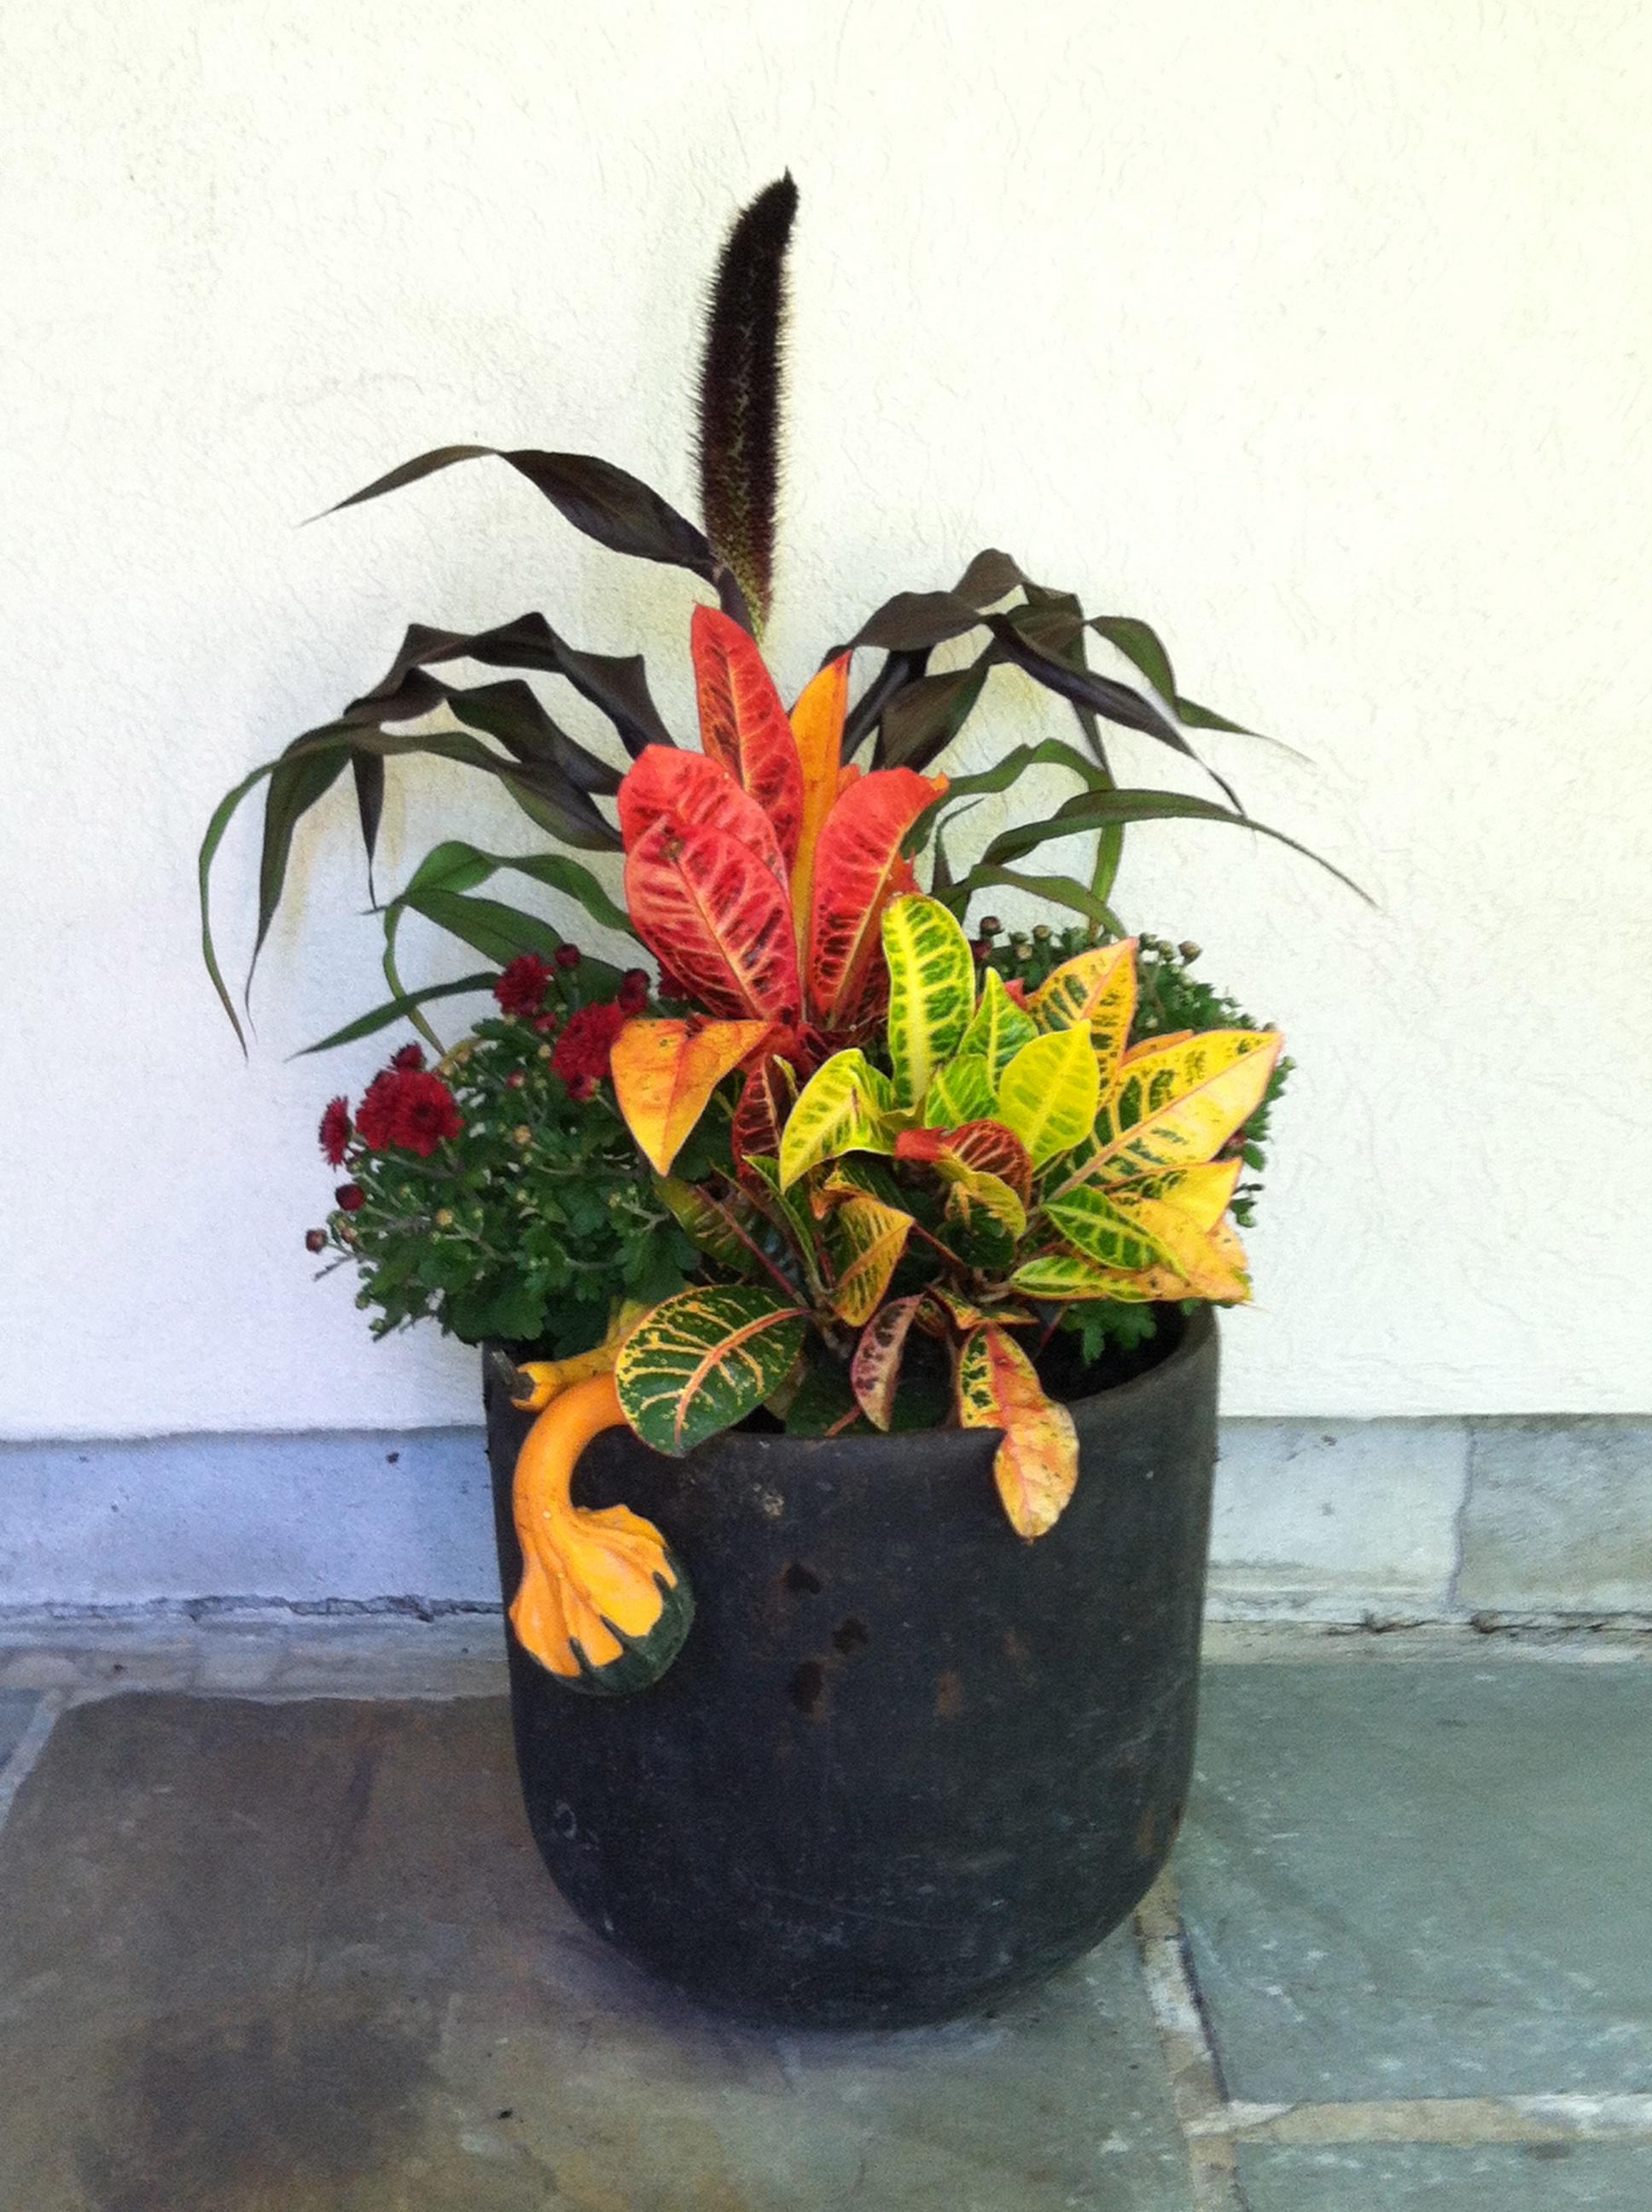 Fall planter by door.